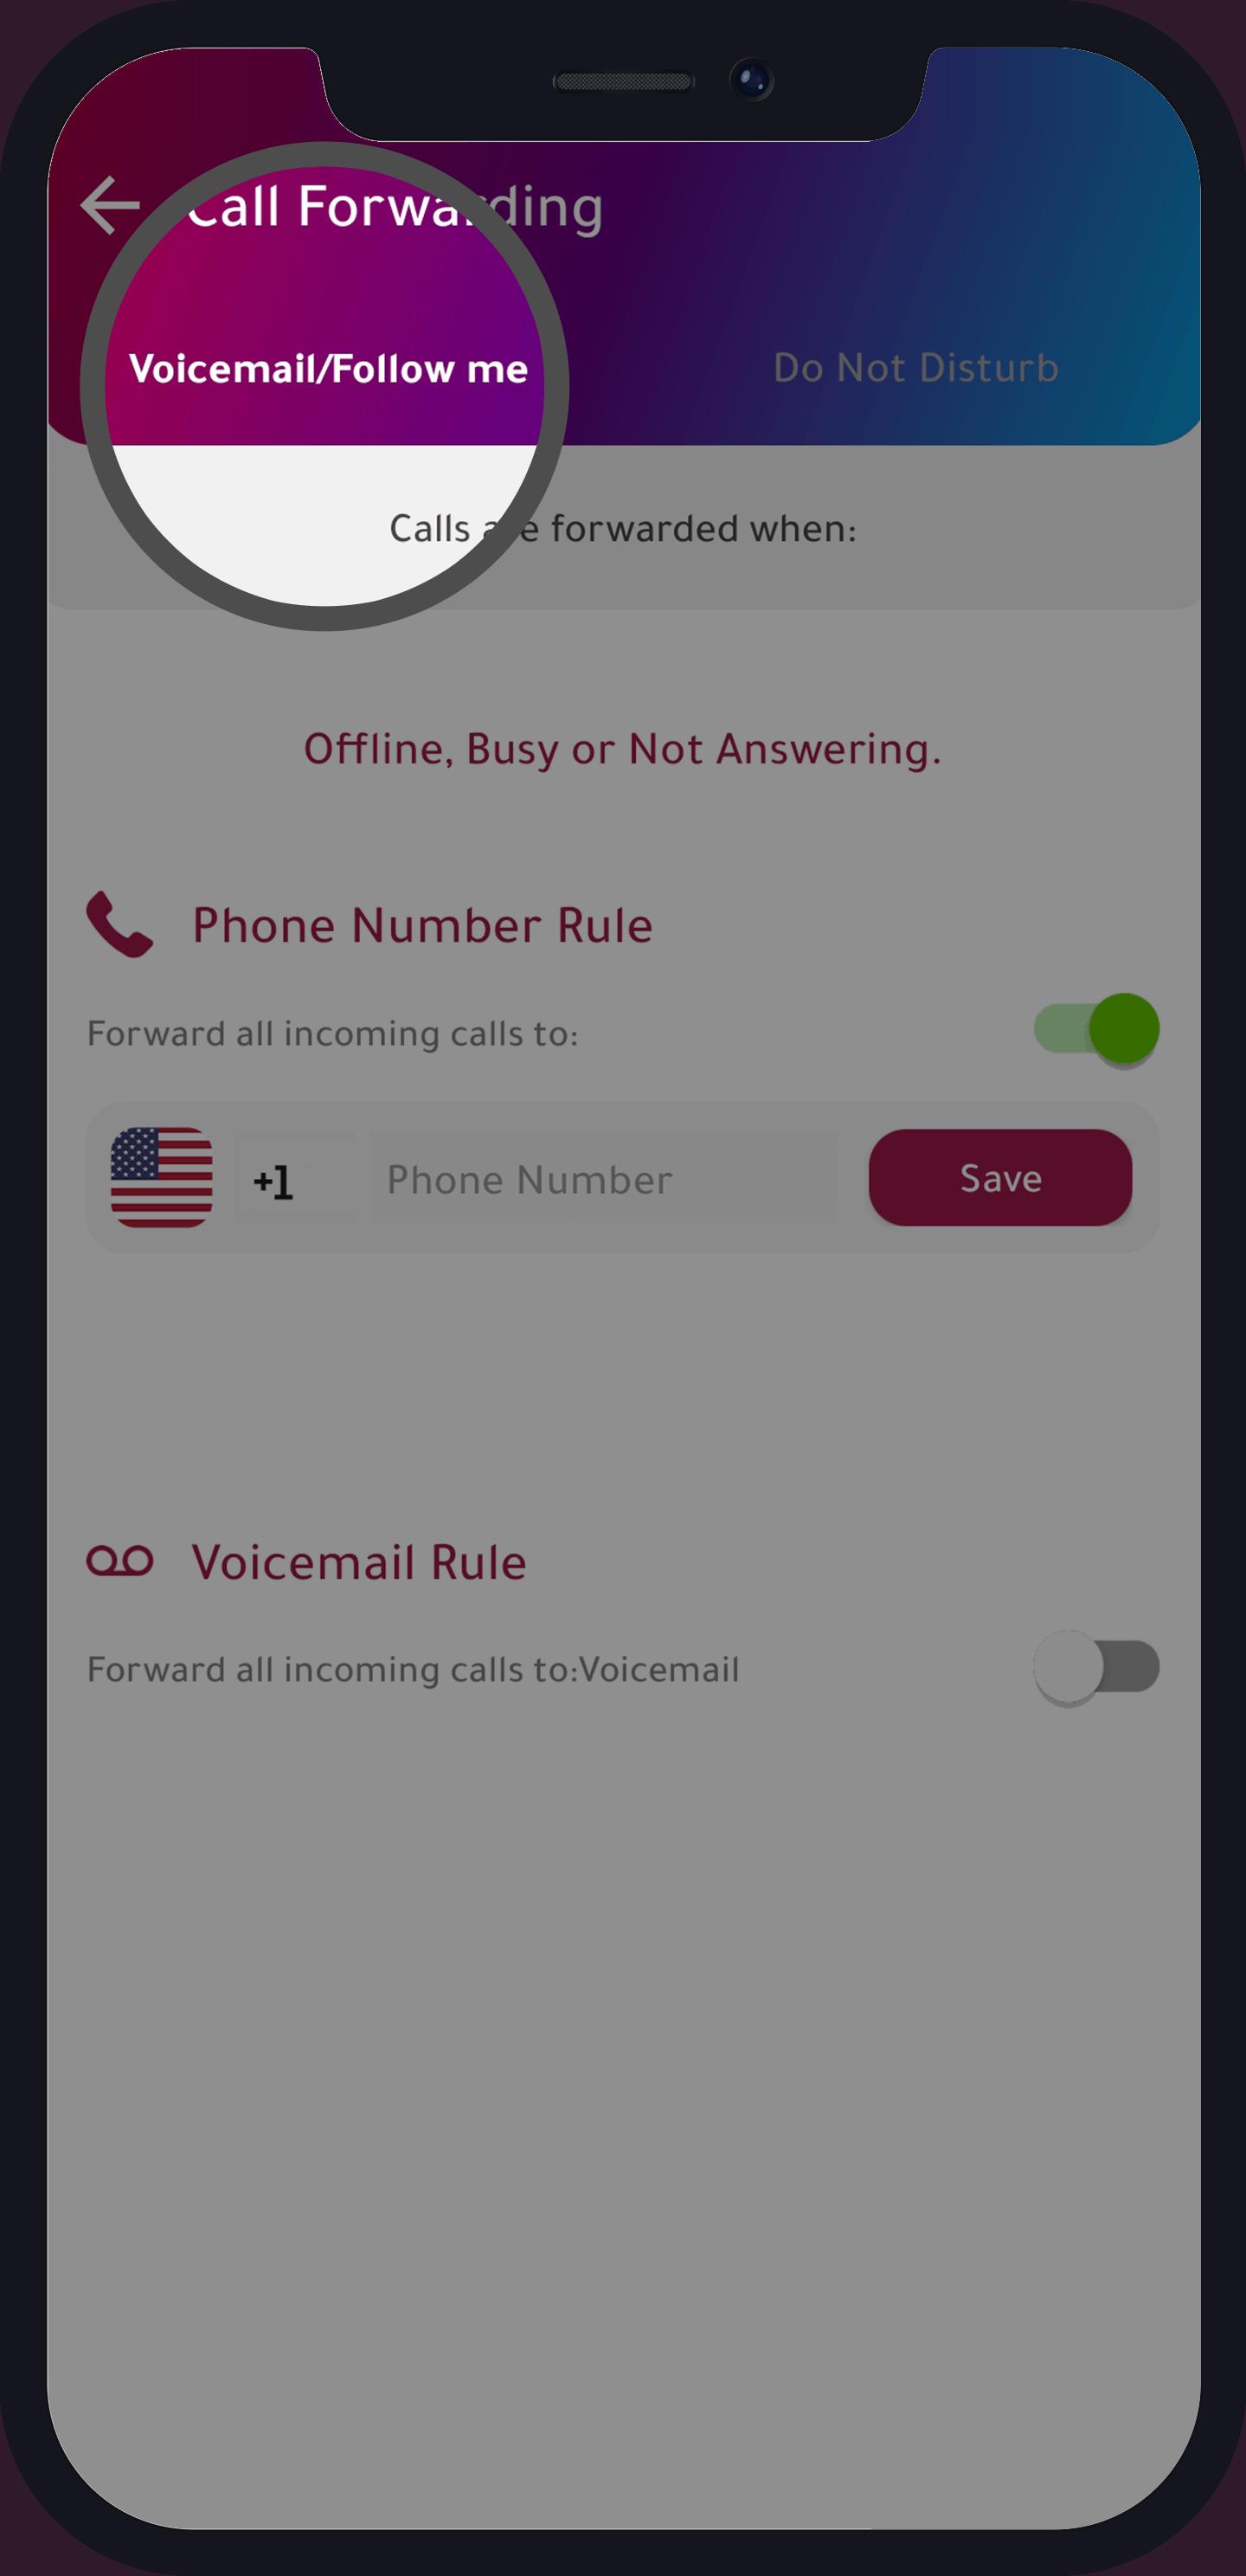 voicemail, follow me